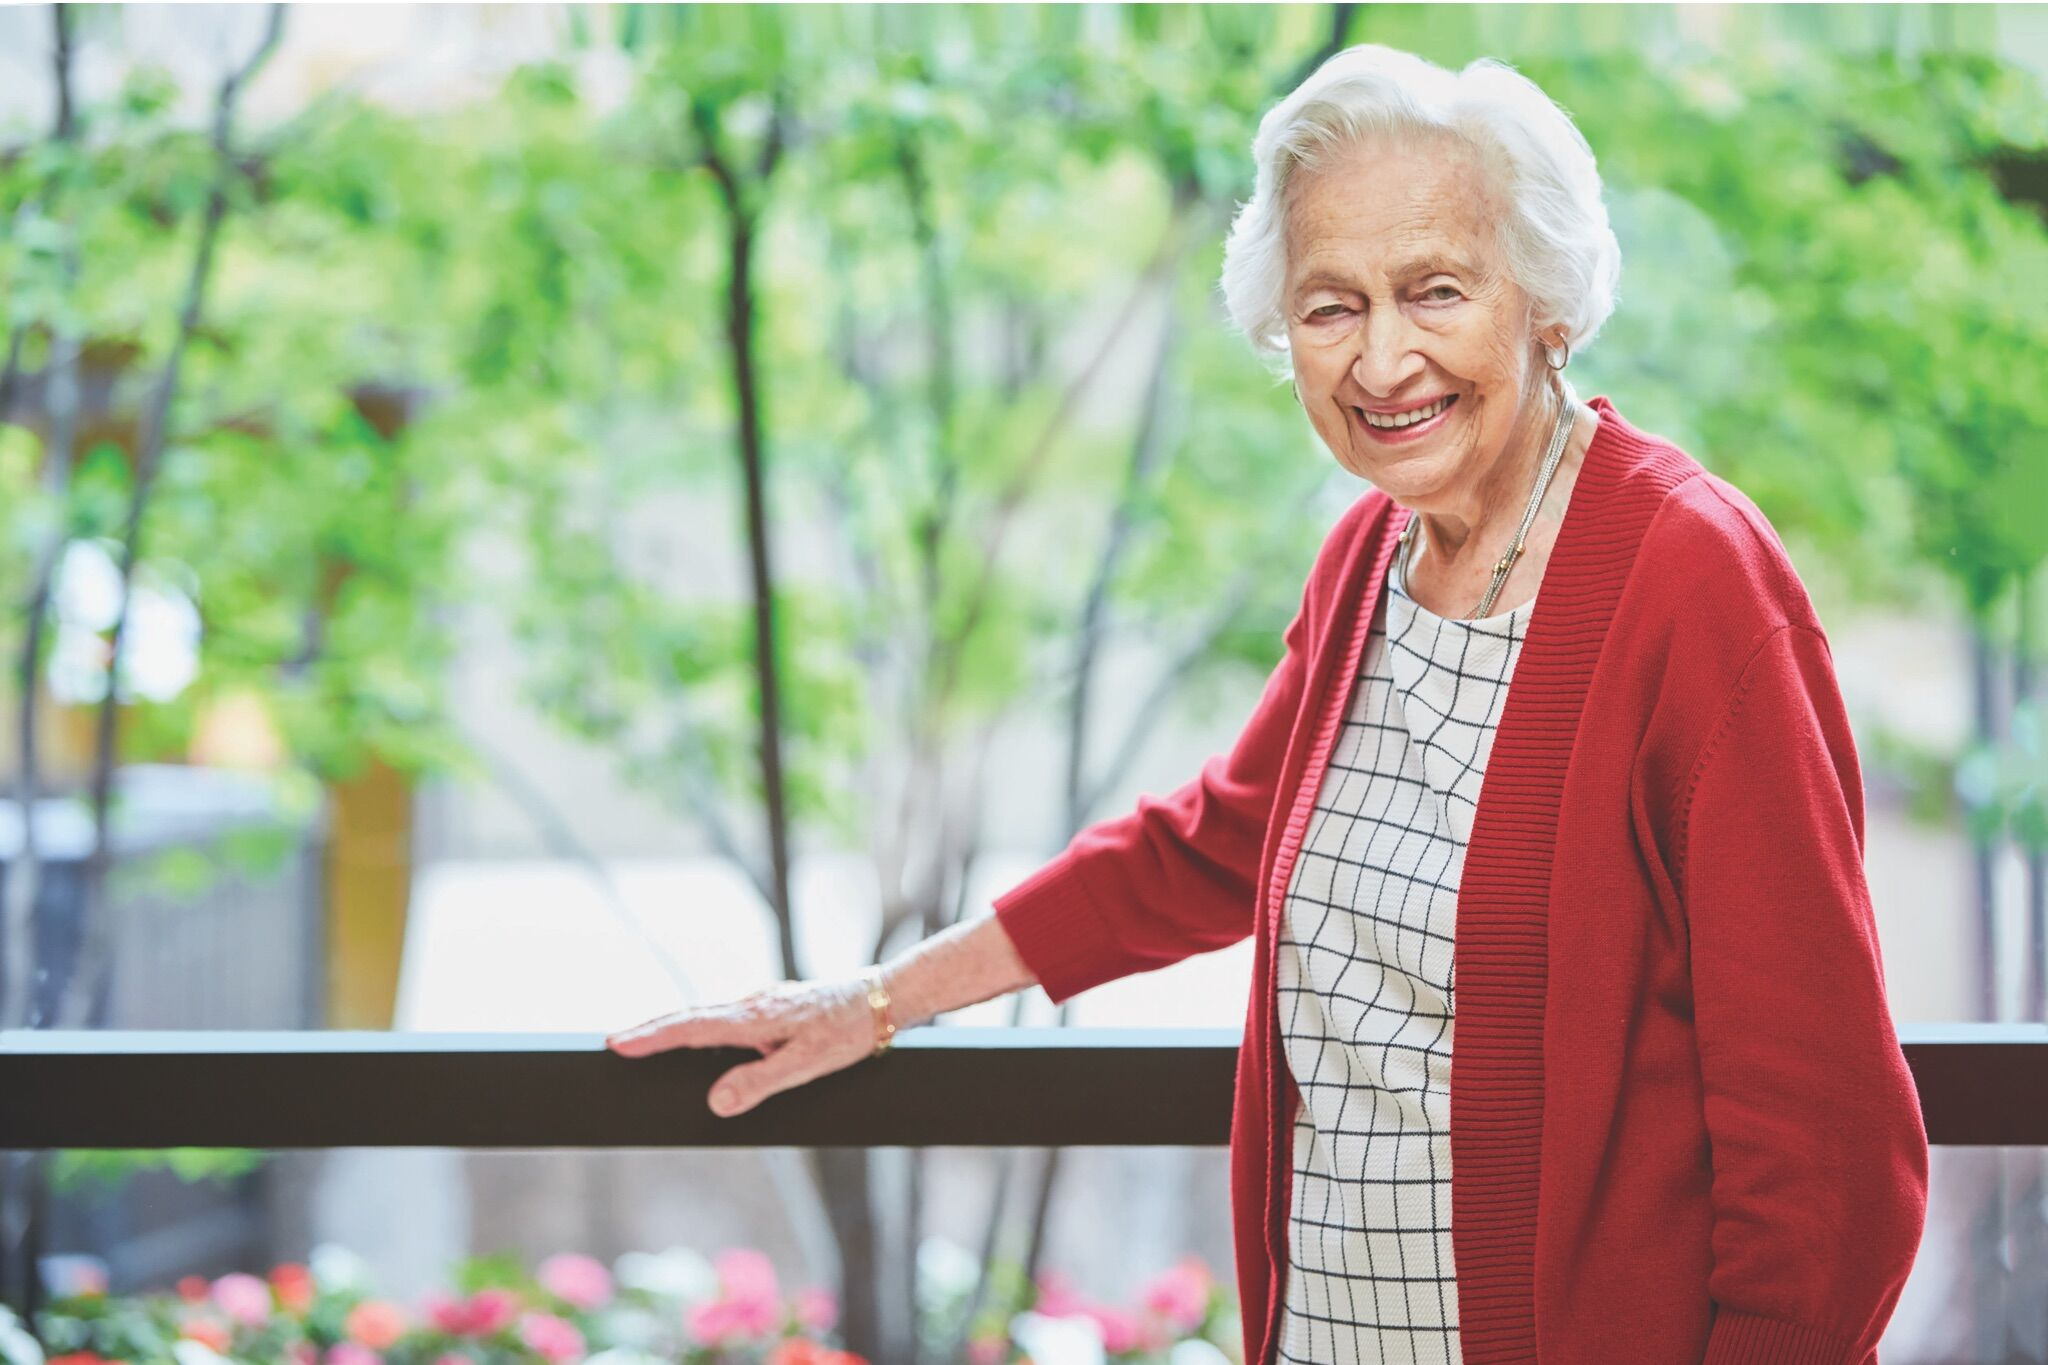 Elderly in community